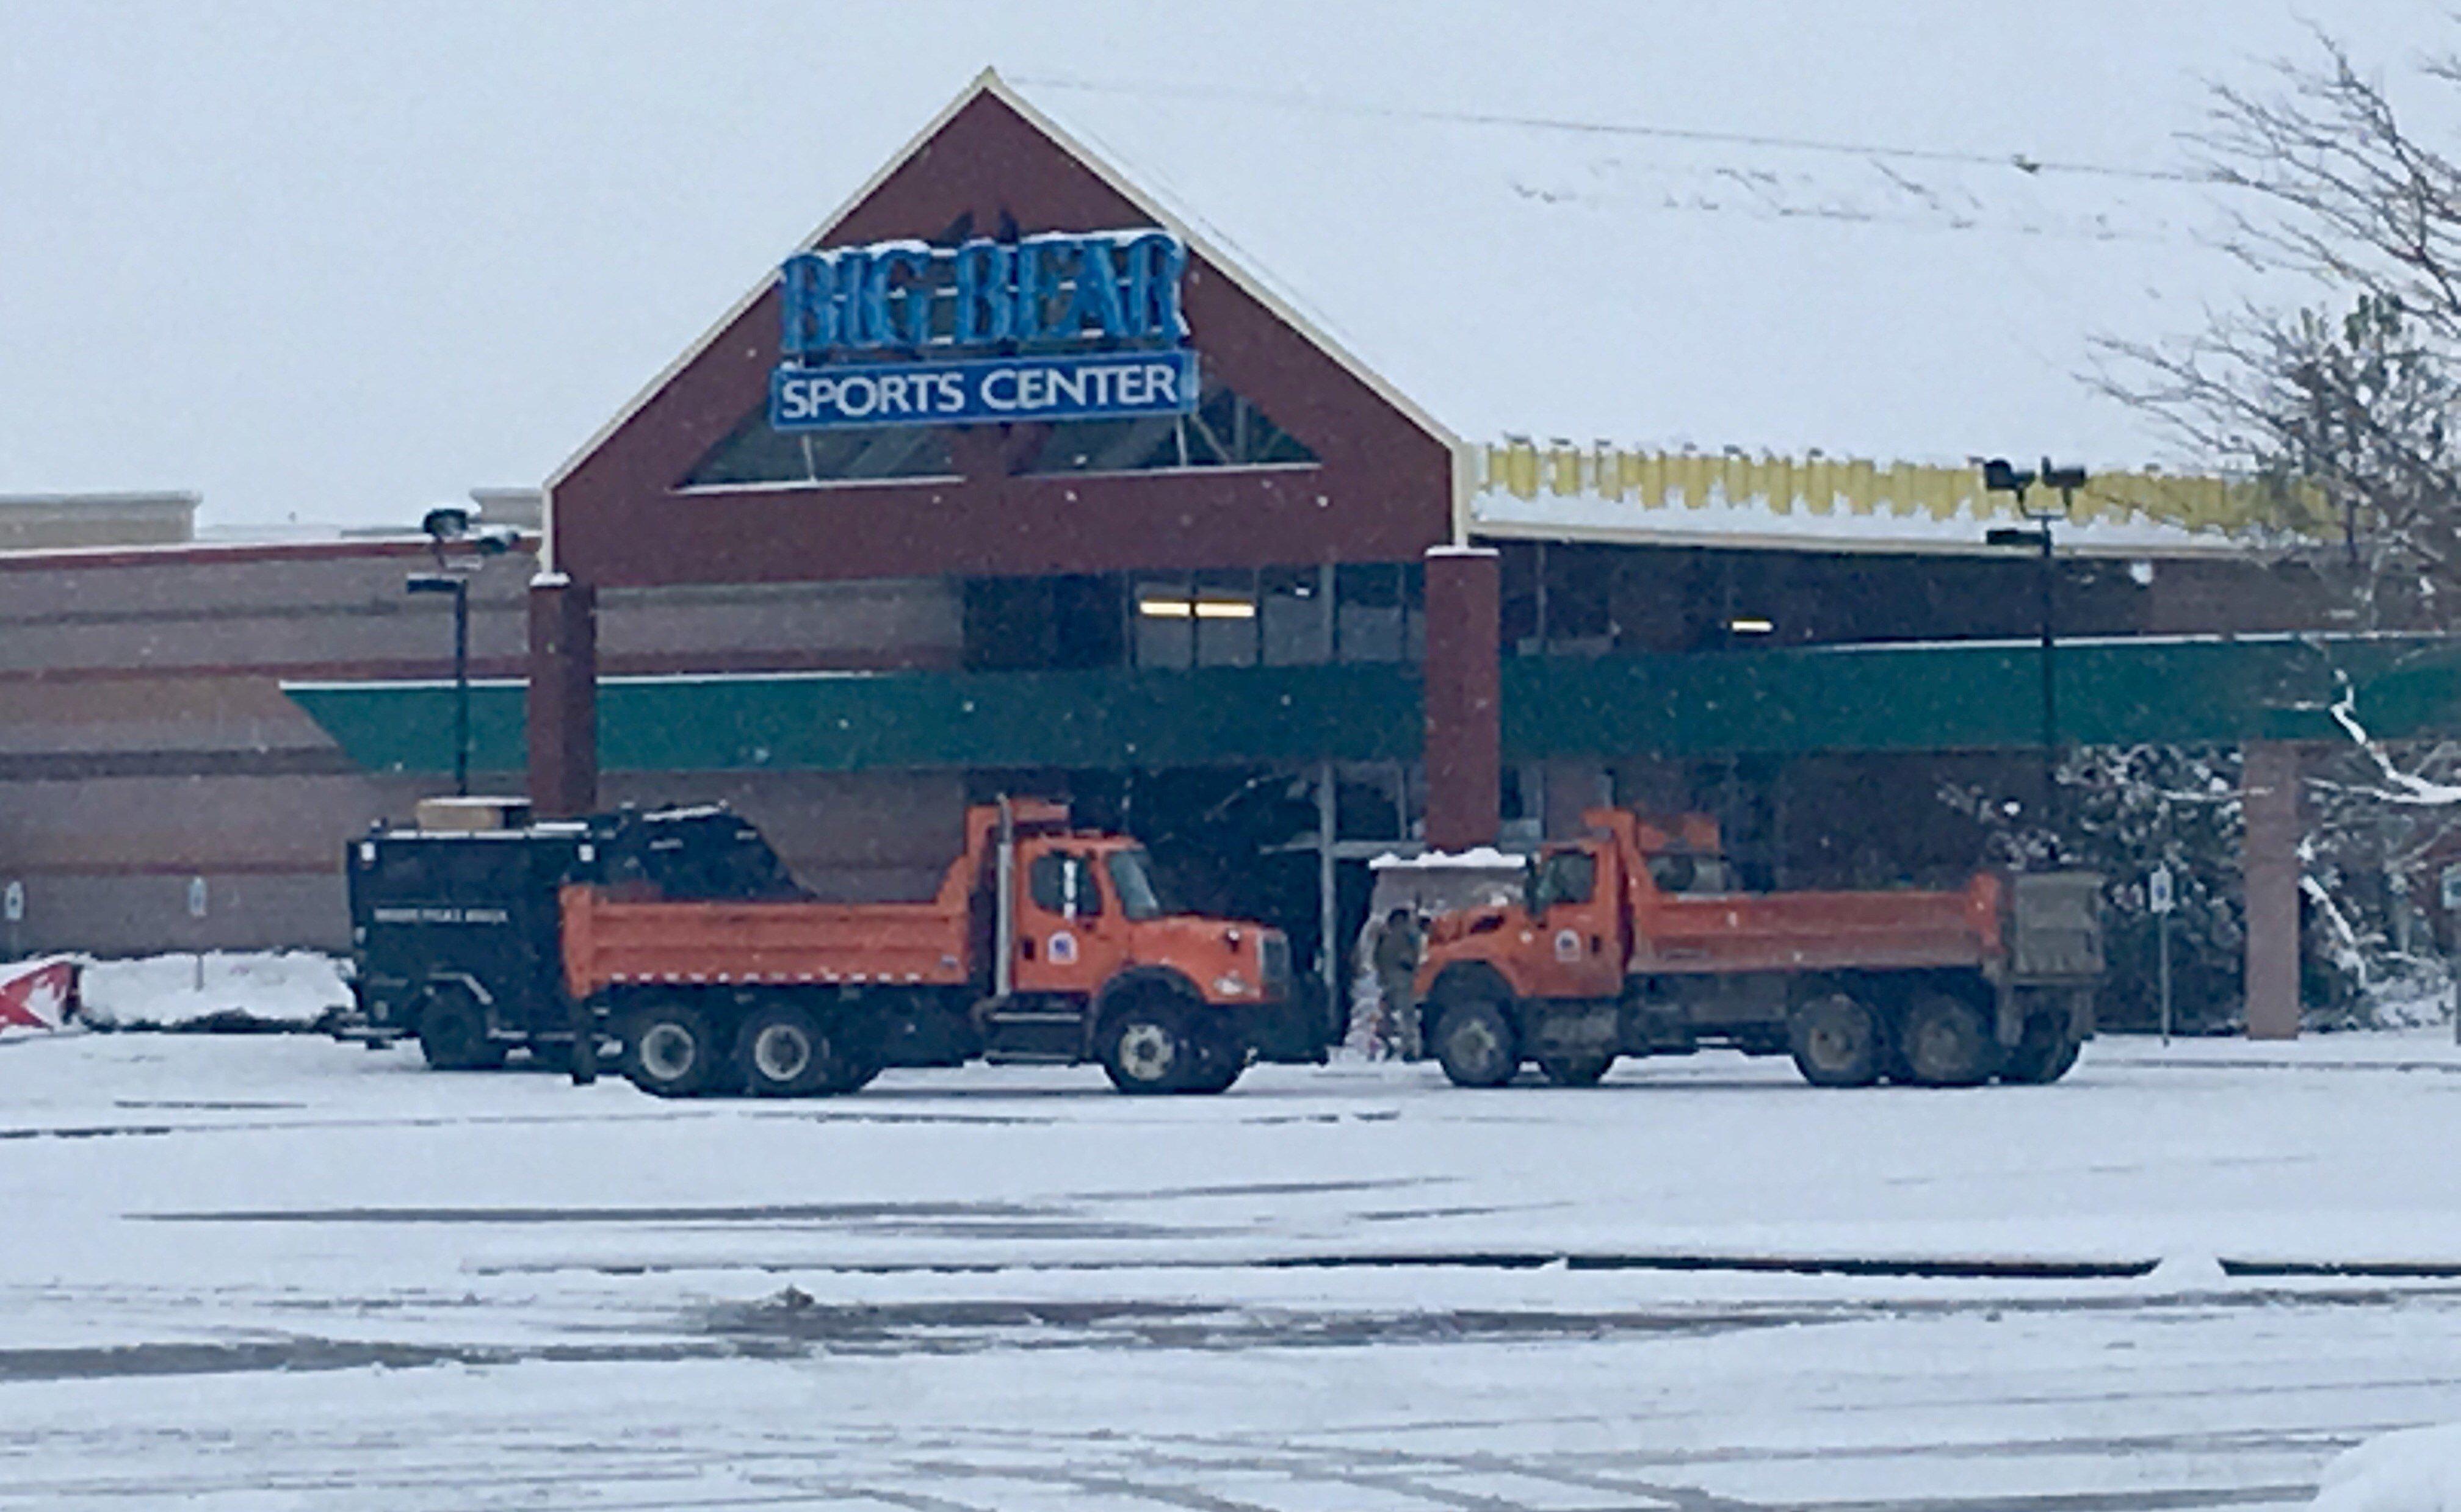 City dump trucks barricade the entrance of Big Bear Sports (MTN News photo)